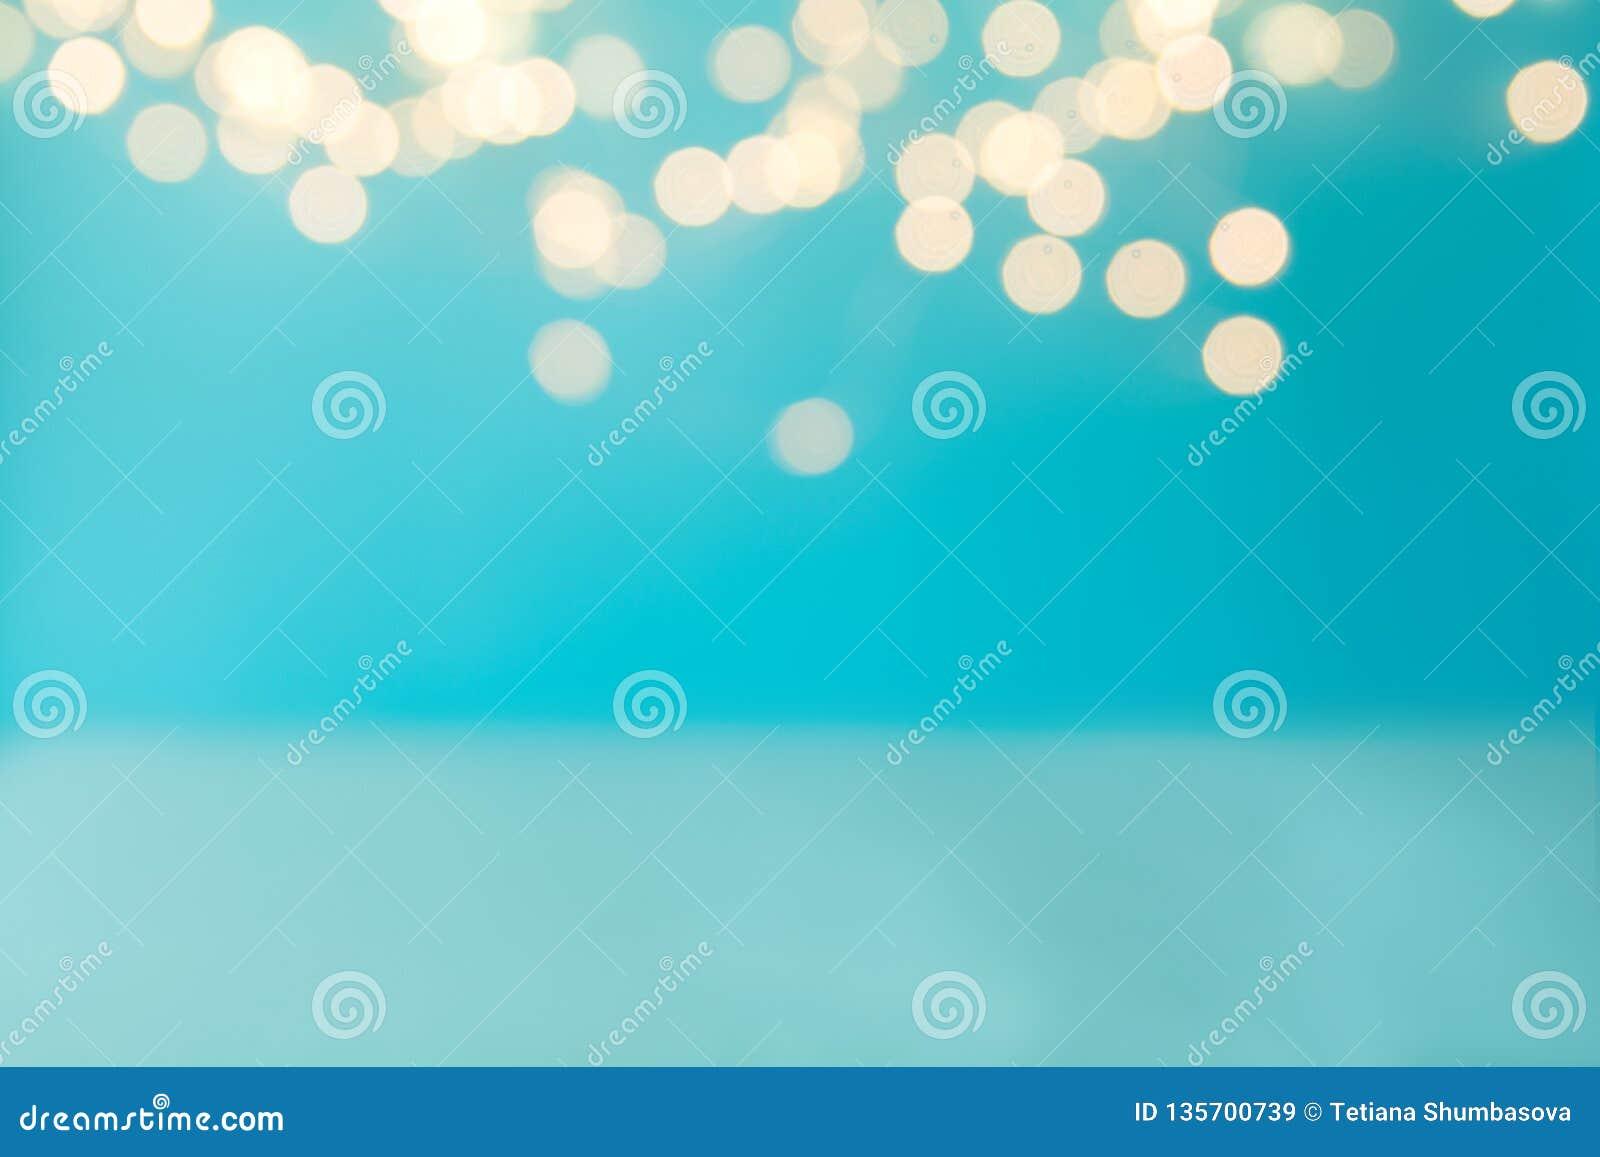 Blue background against defocused light. Holiday celebration concept. Copy space